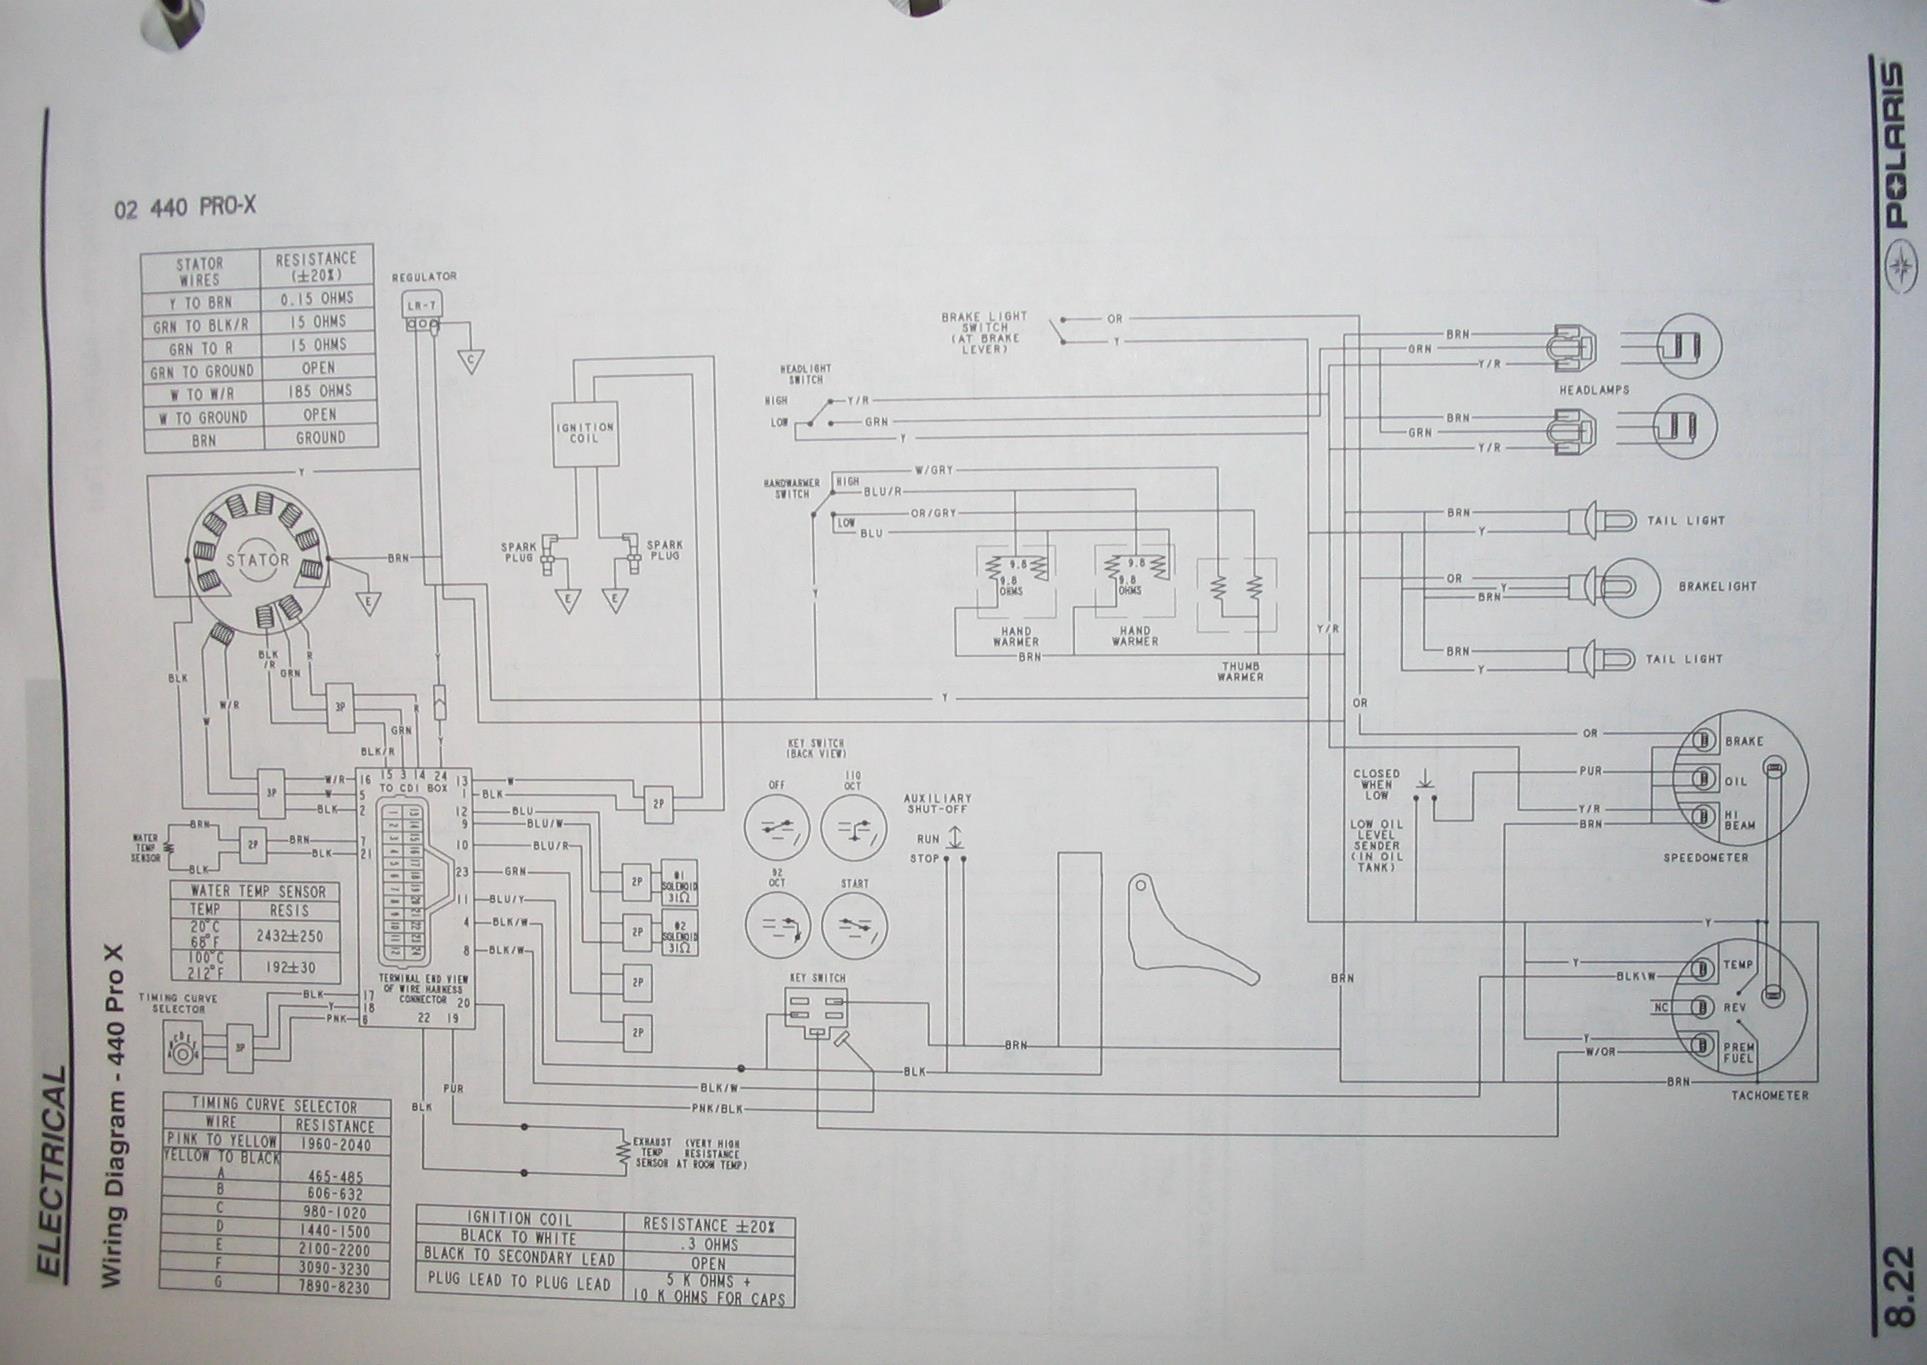 Wiring Diagram Additionally Polaris Snowmobile Wiring Diagrams